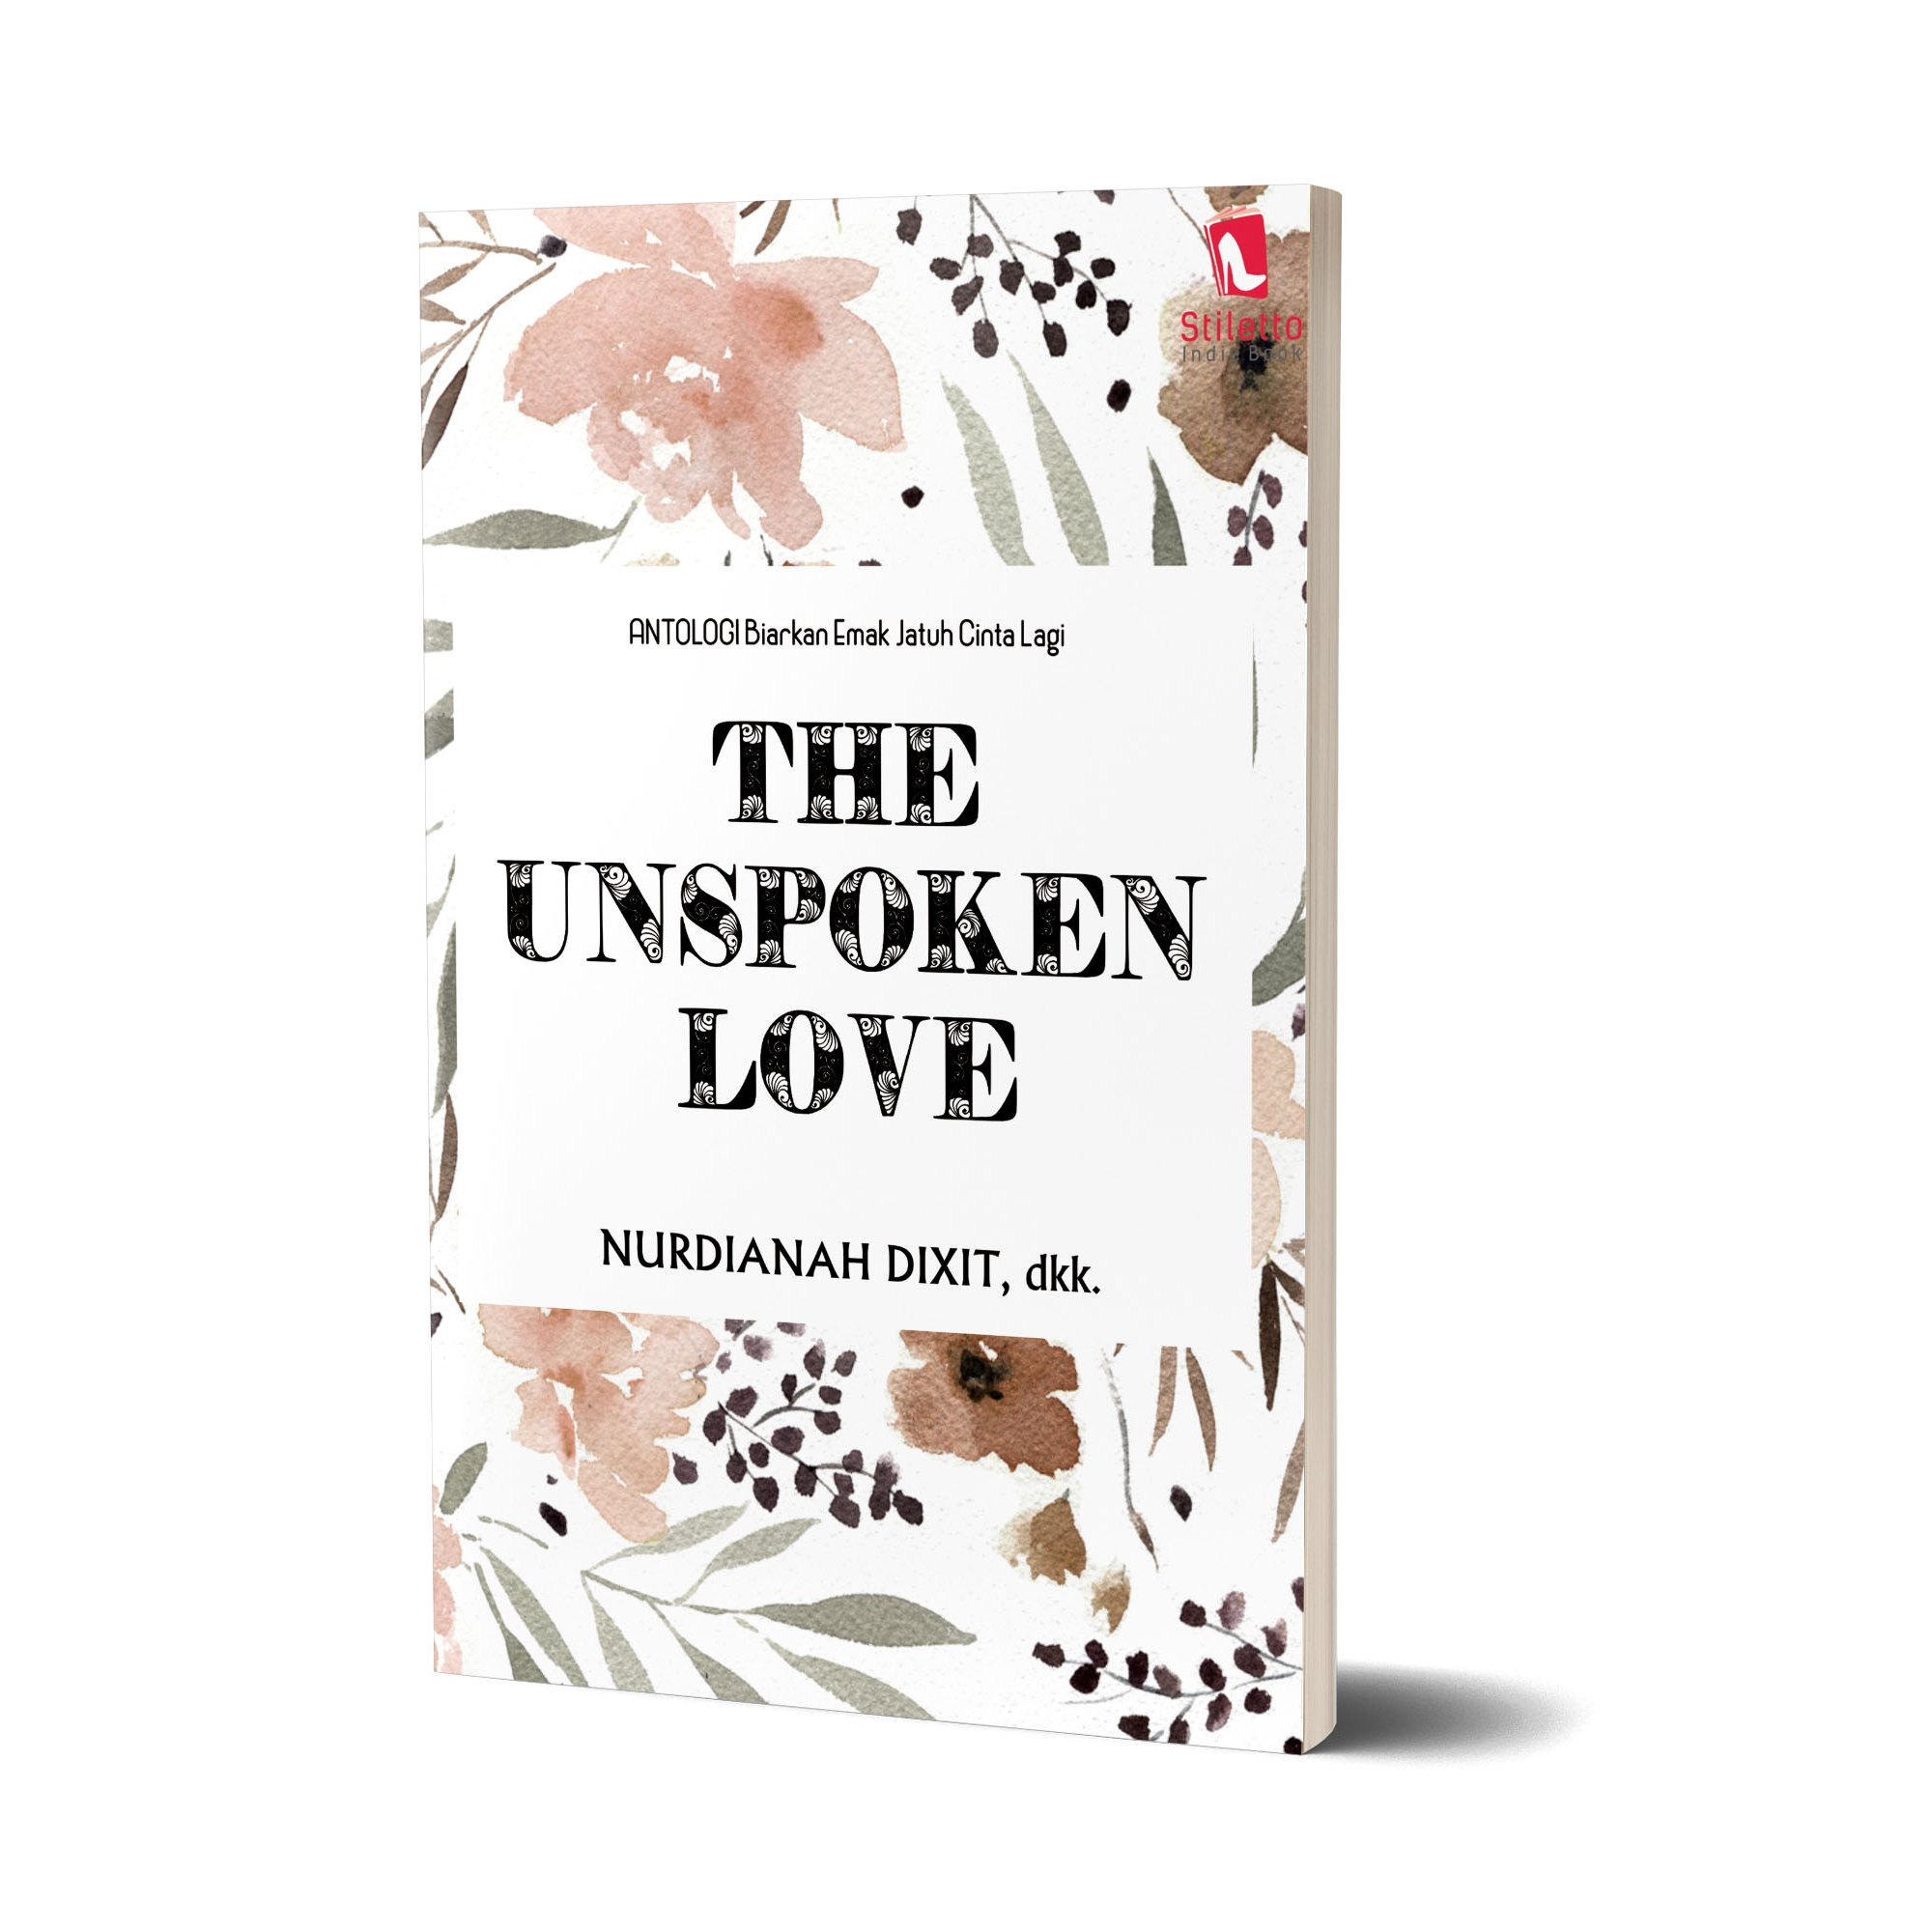 The Unspoken Love